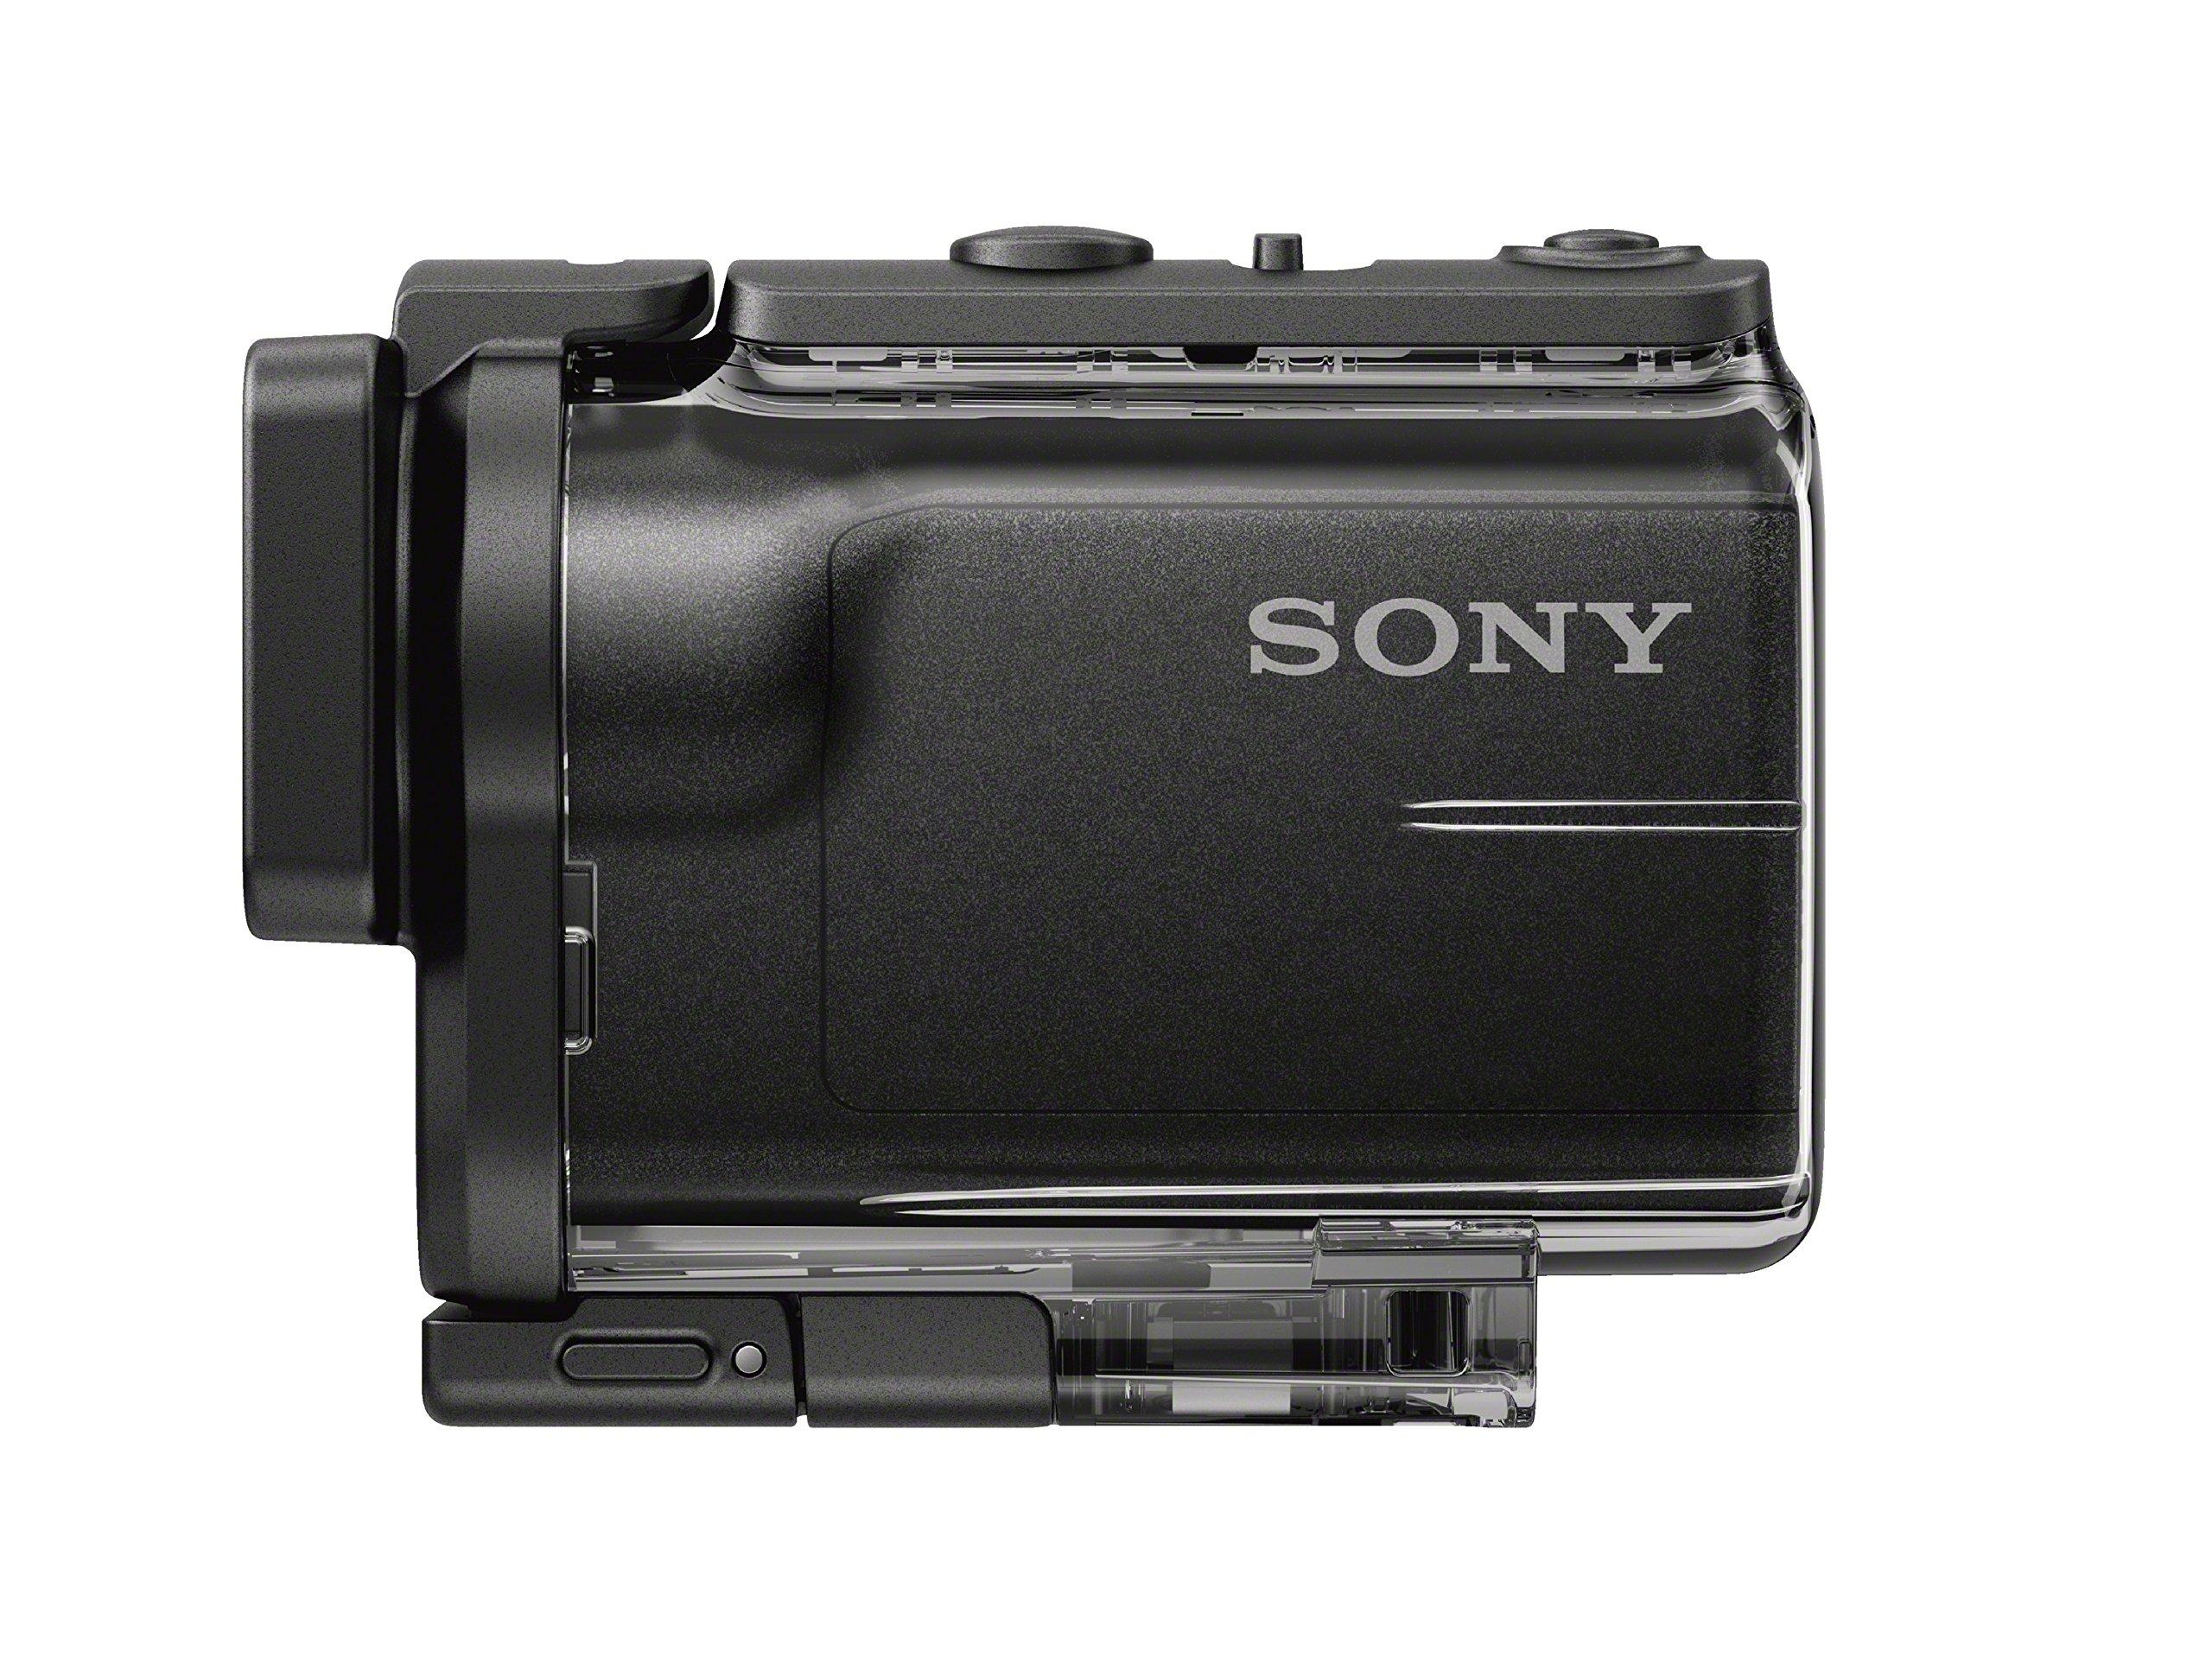 Sony HDRAS50/B Full HD Action Cam (Black)